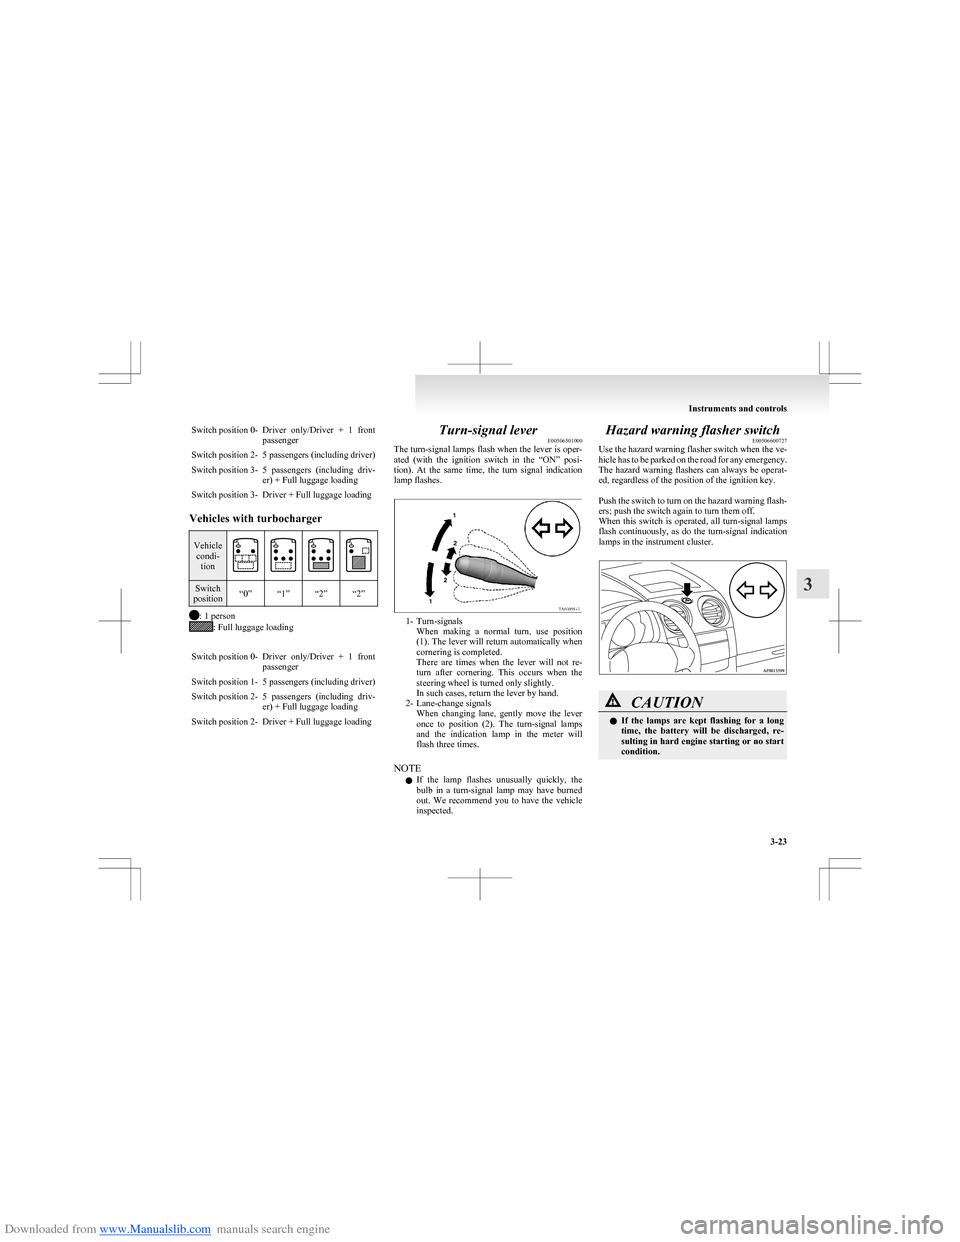 MITSUBISHI COLT 2009 10.G Owners Manual